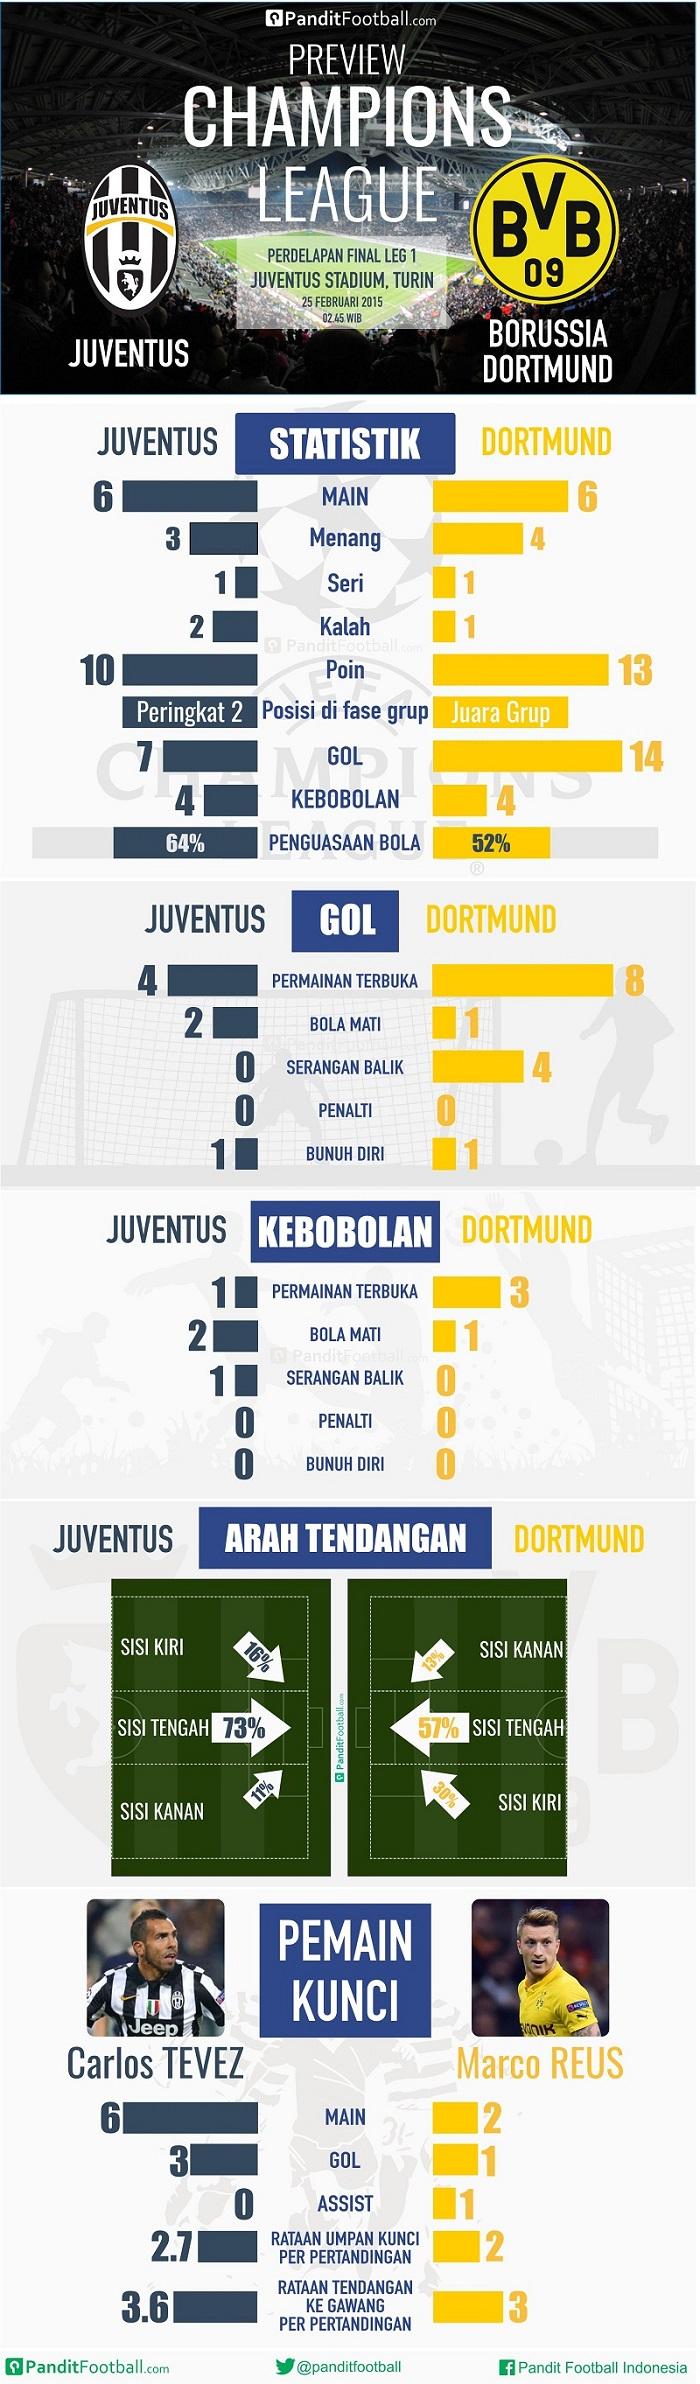 Juve Dortmund (1)